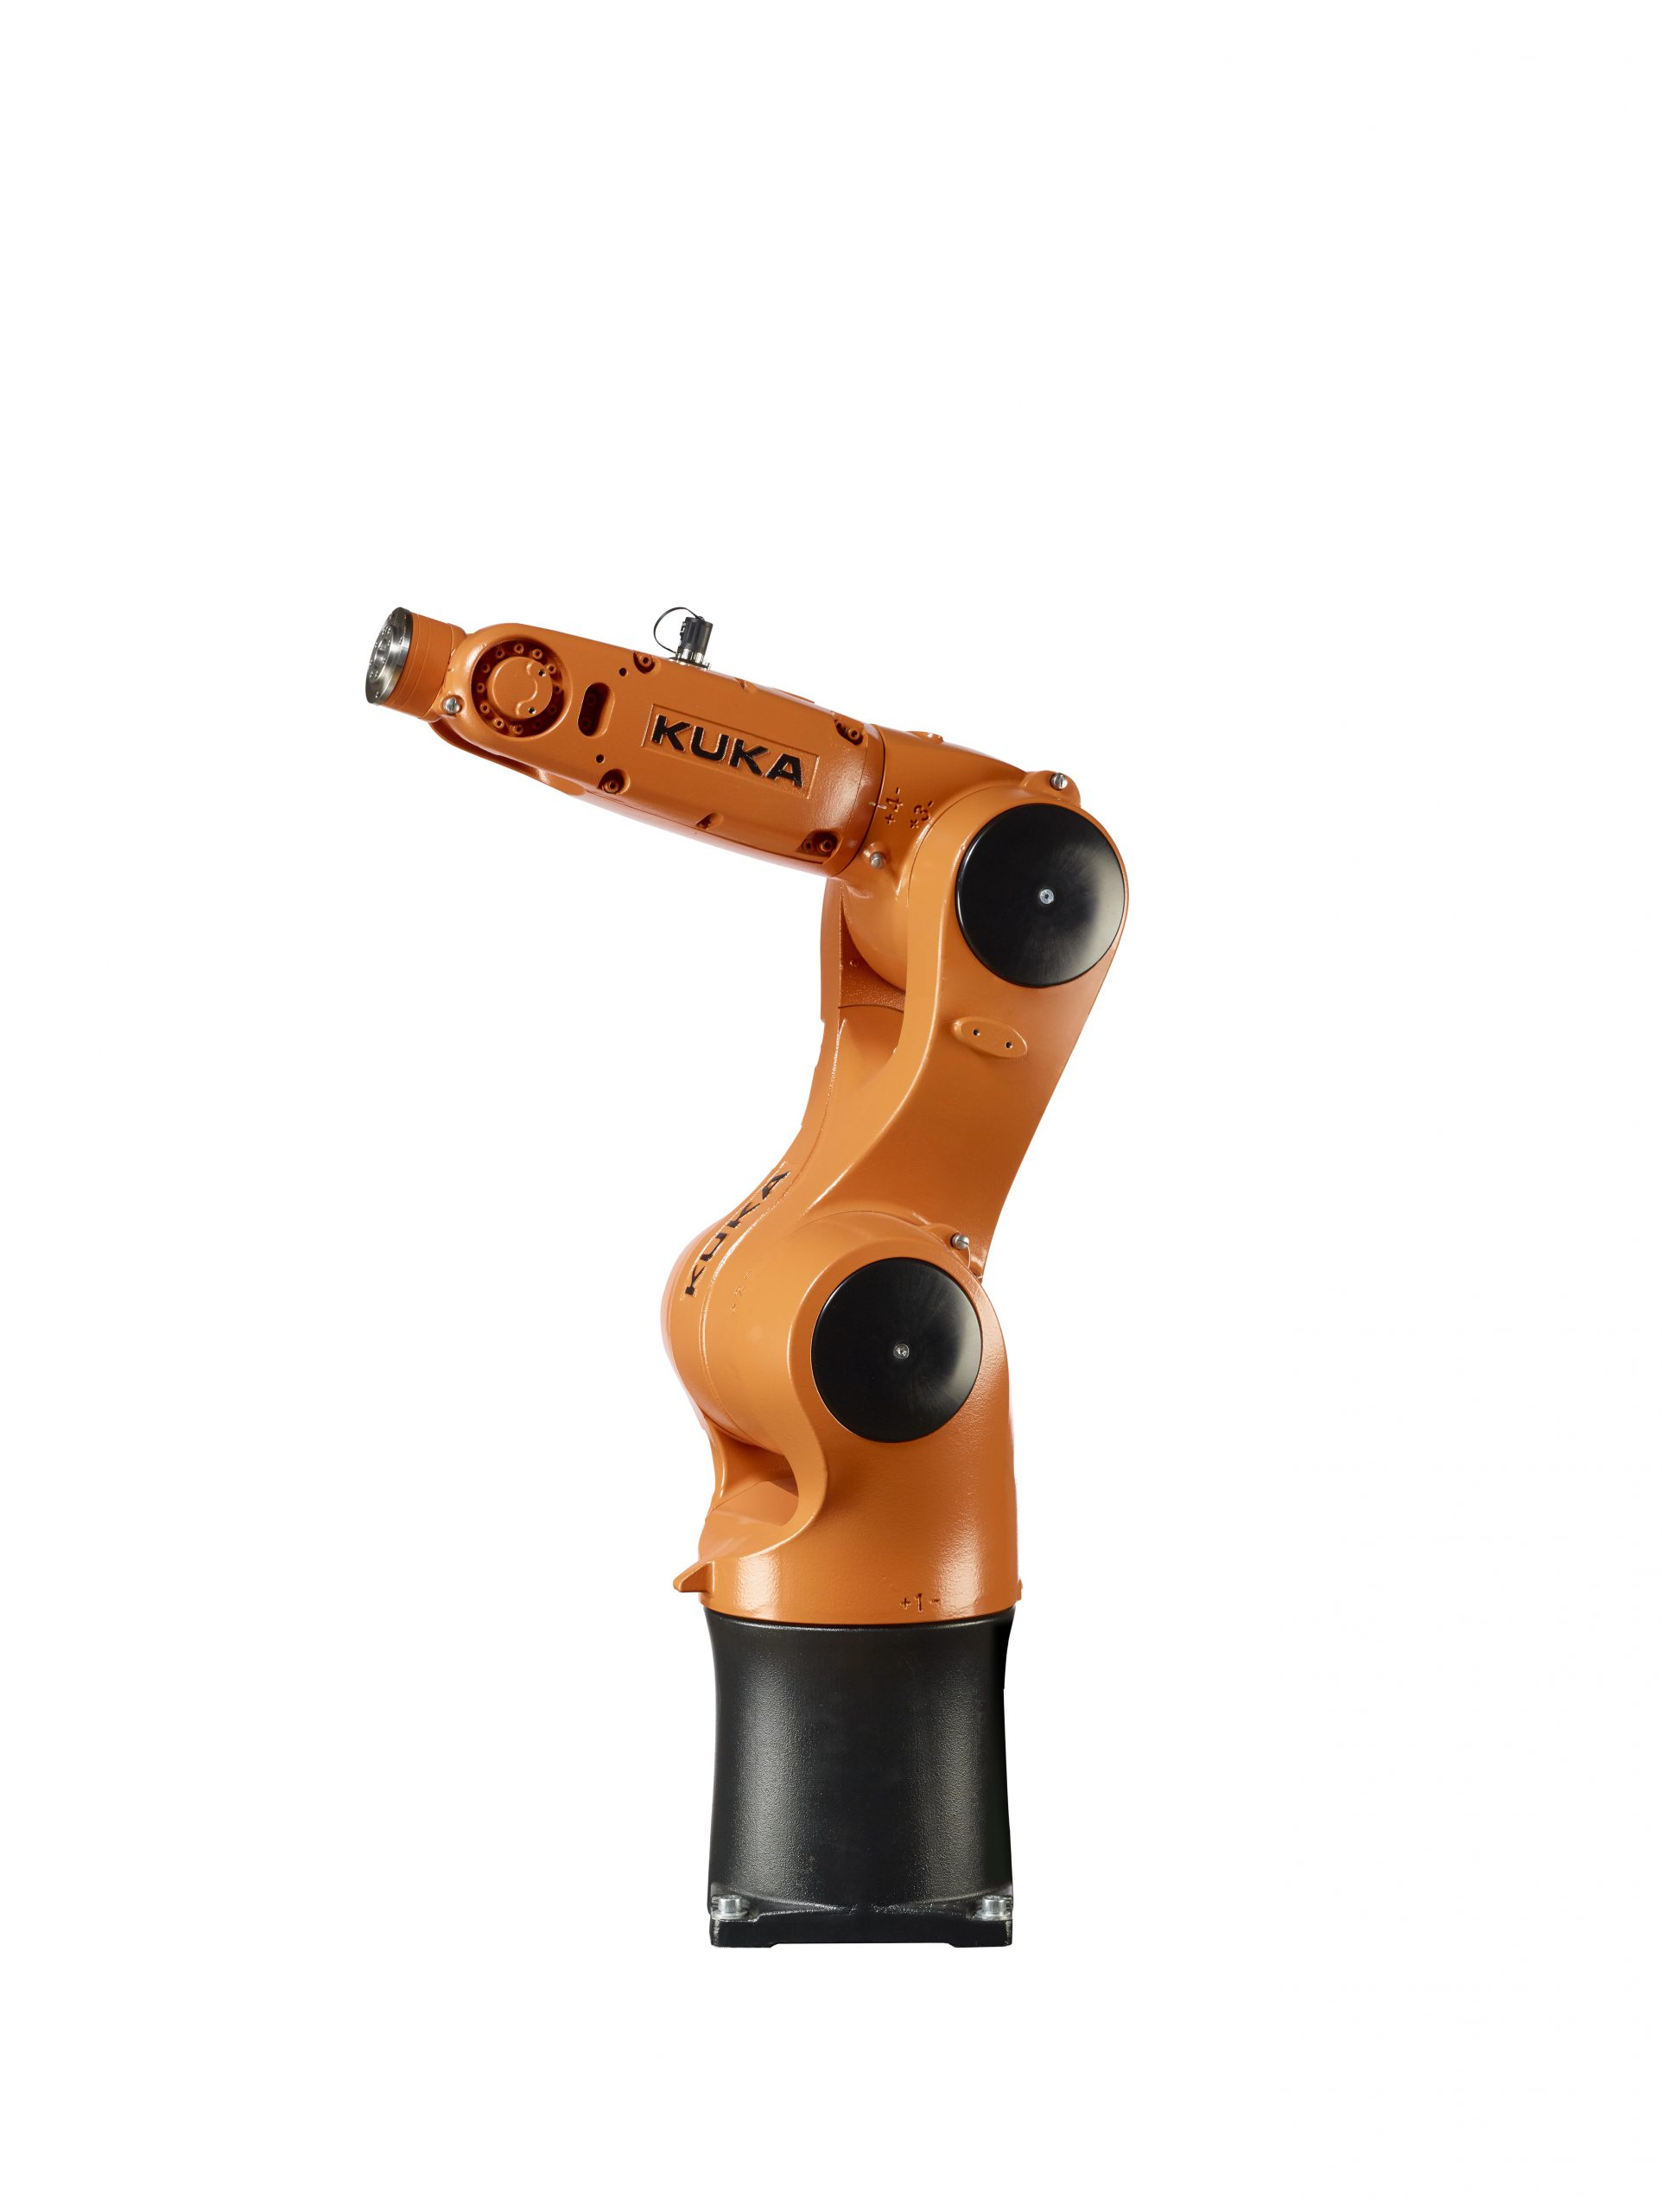 KUKA KR 6 R700 sixx WP (KR AGILUS)-1